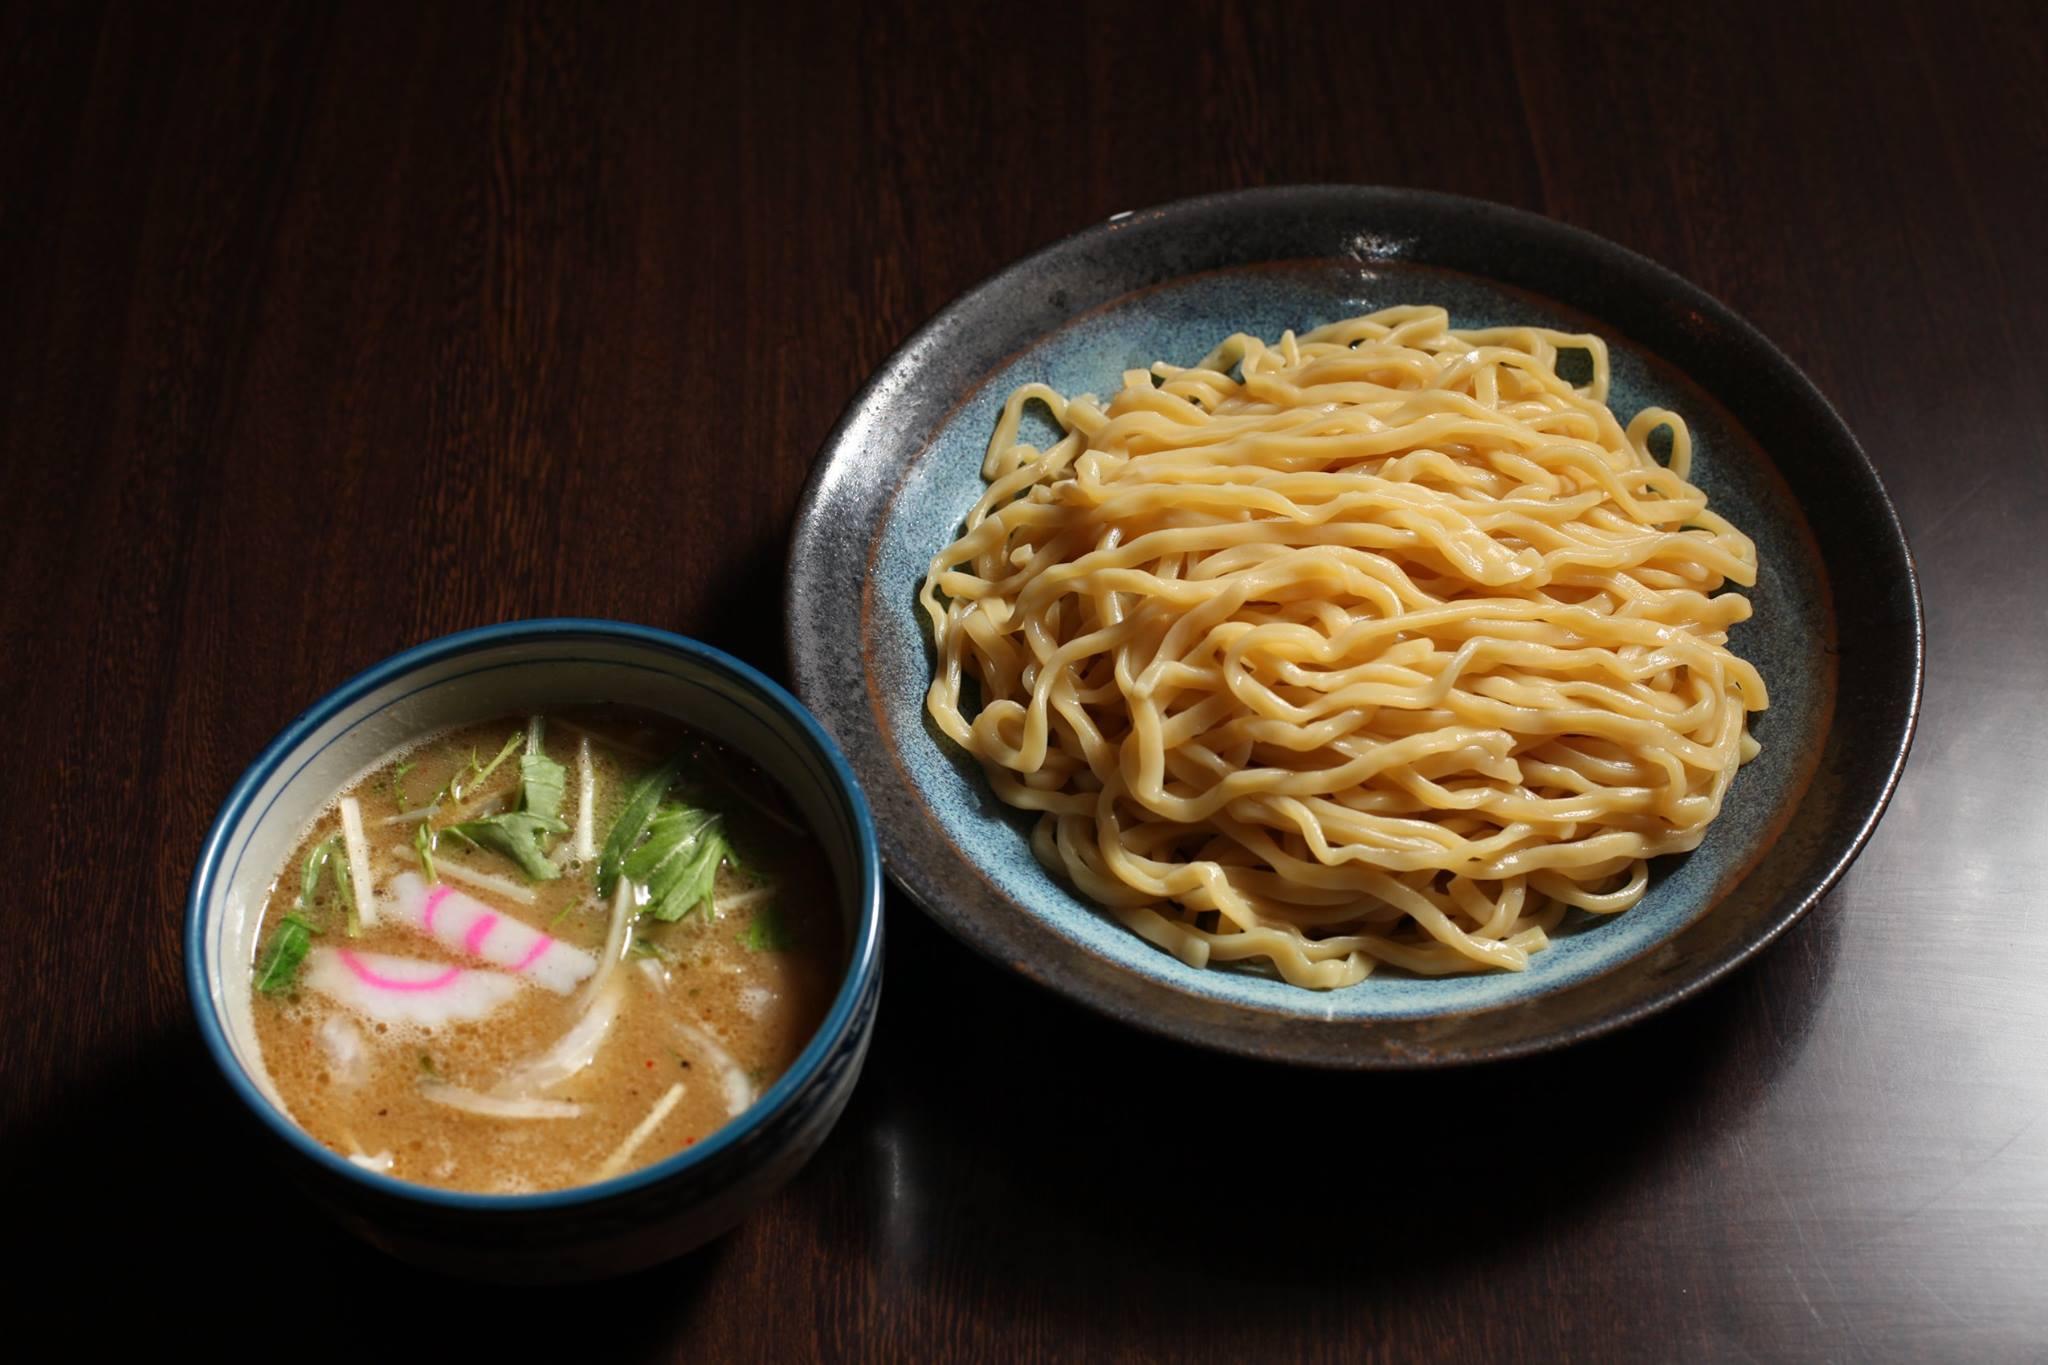 麺彩房中野本店平日夜限定鶏豚塩つけ麺